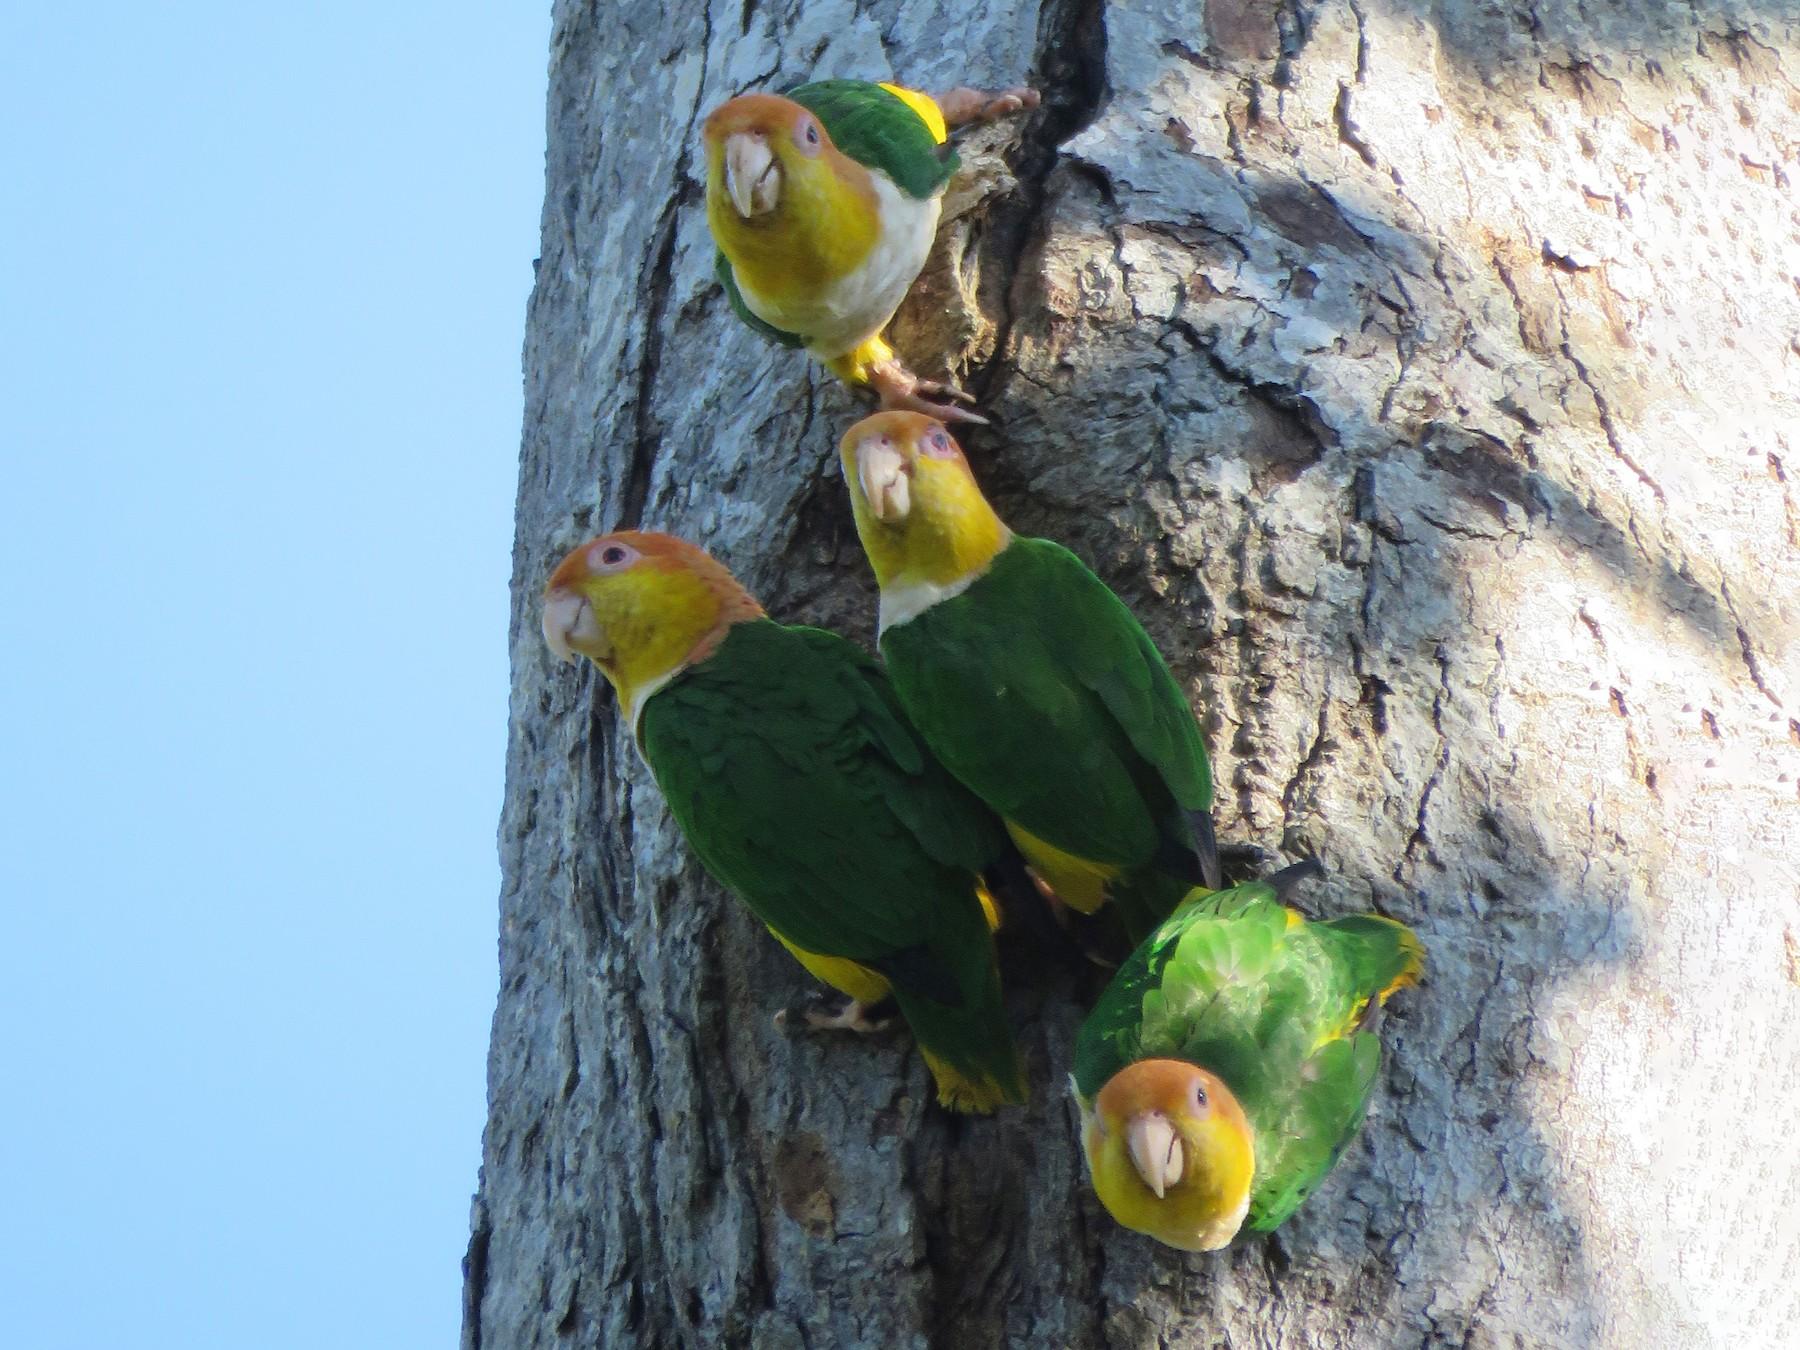 White-bellied Parrot - Vincent Vos